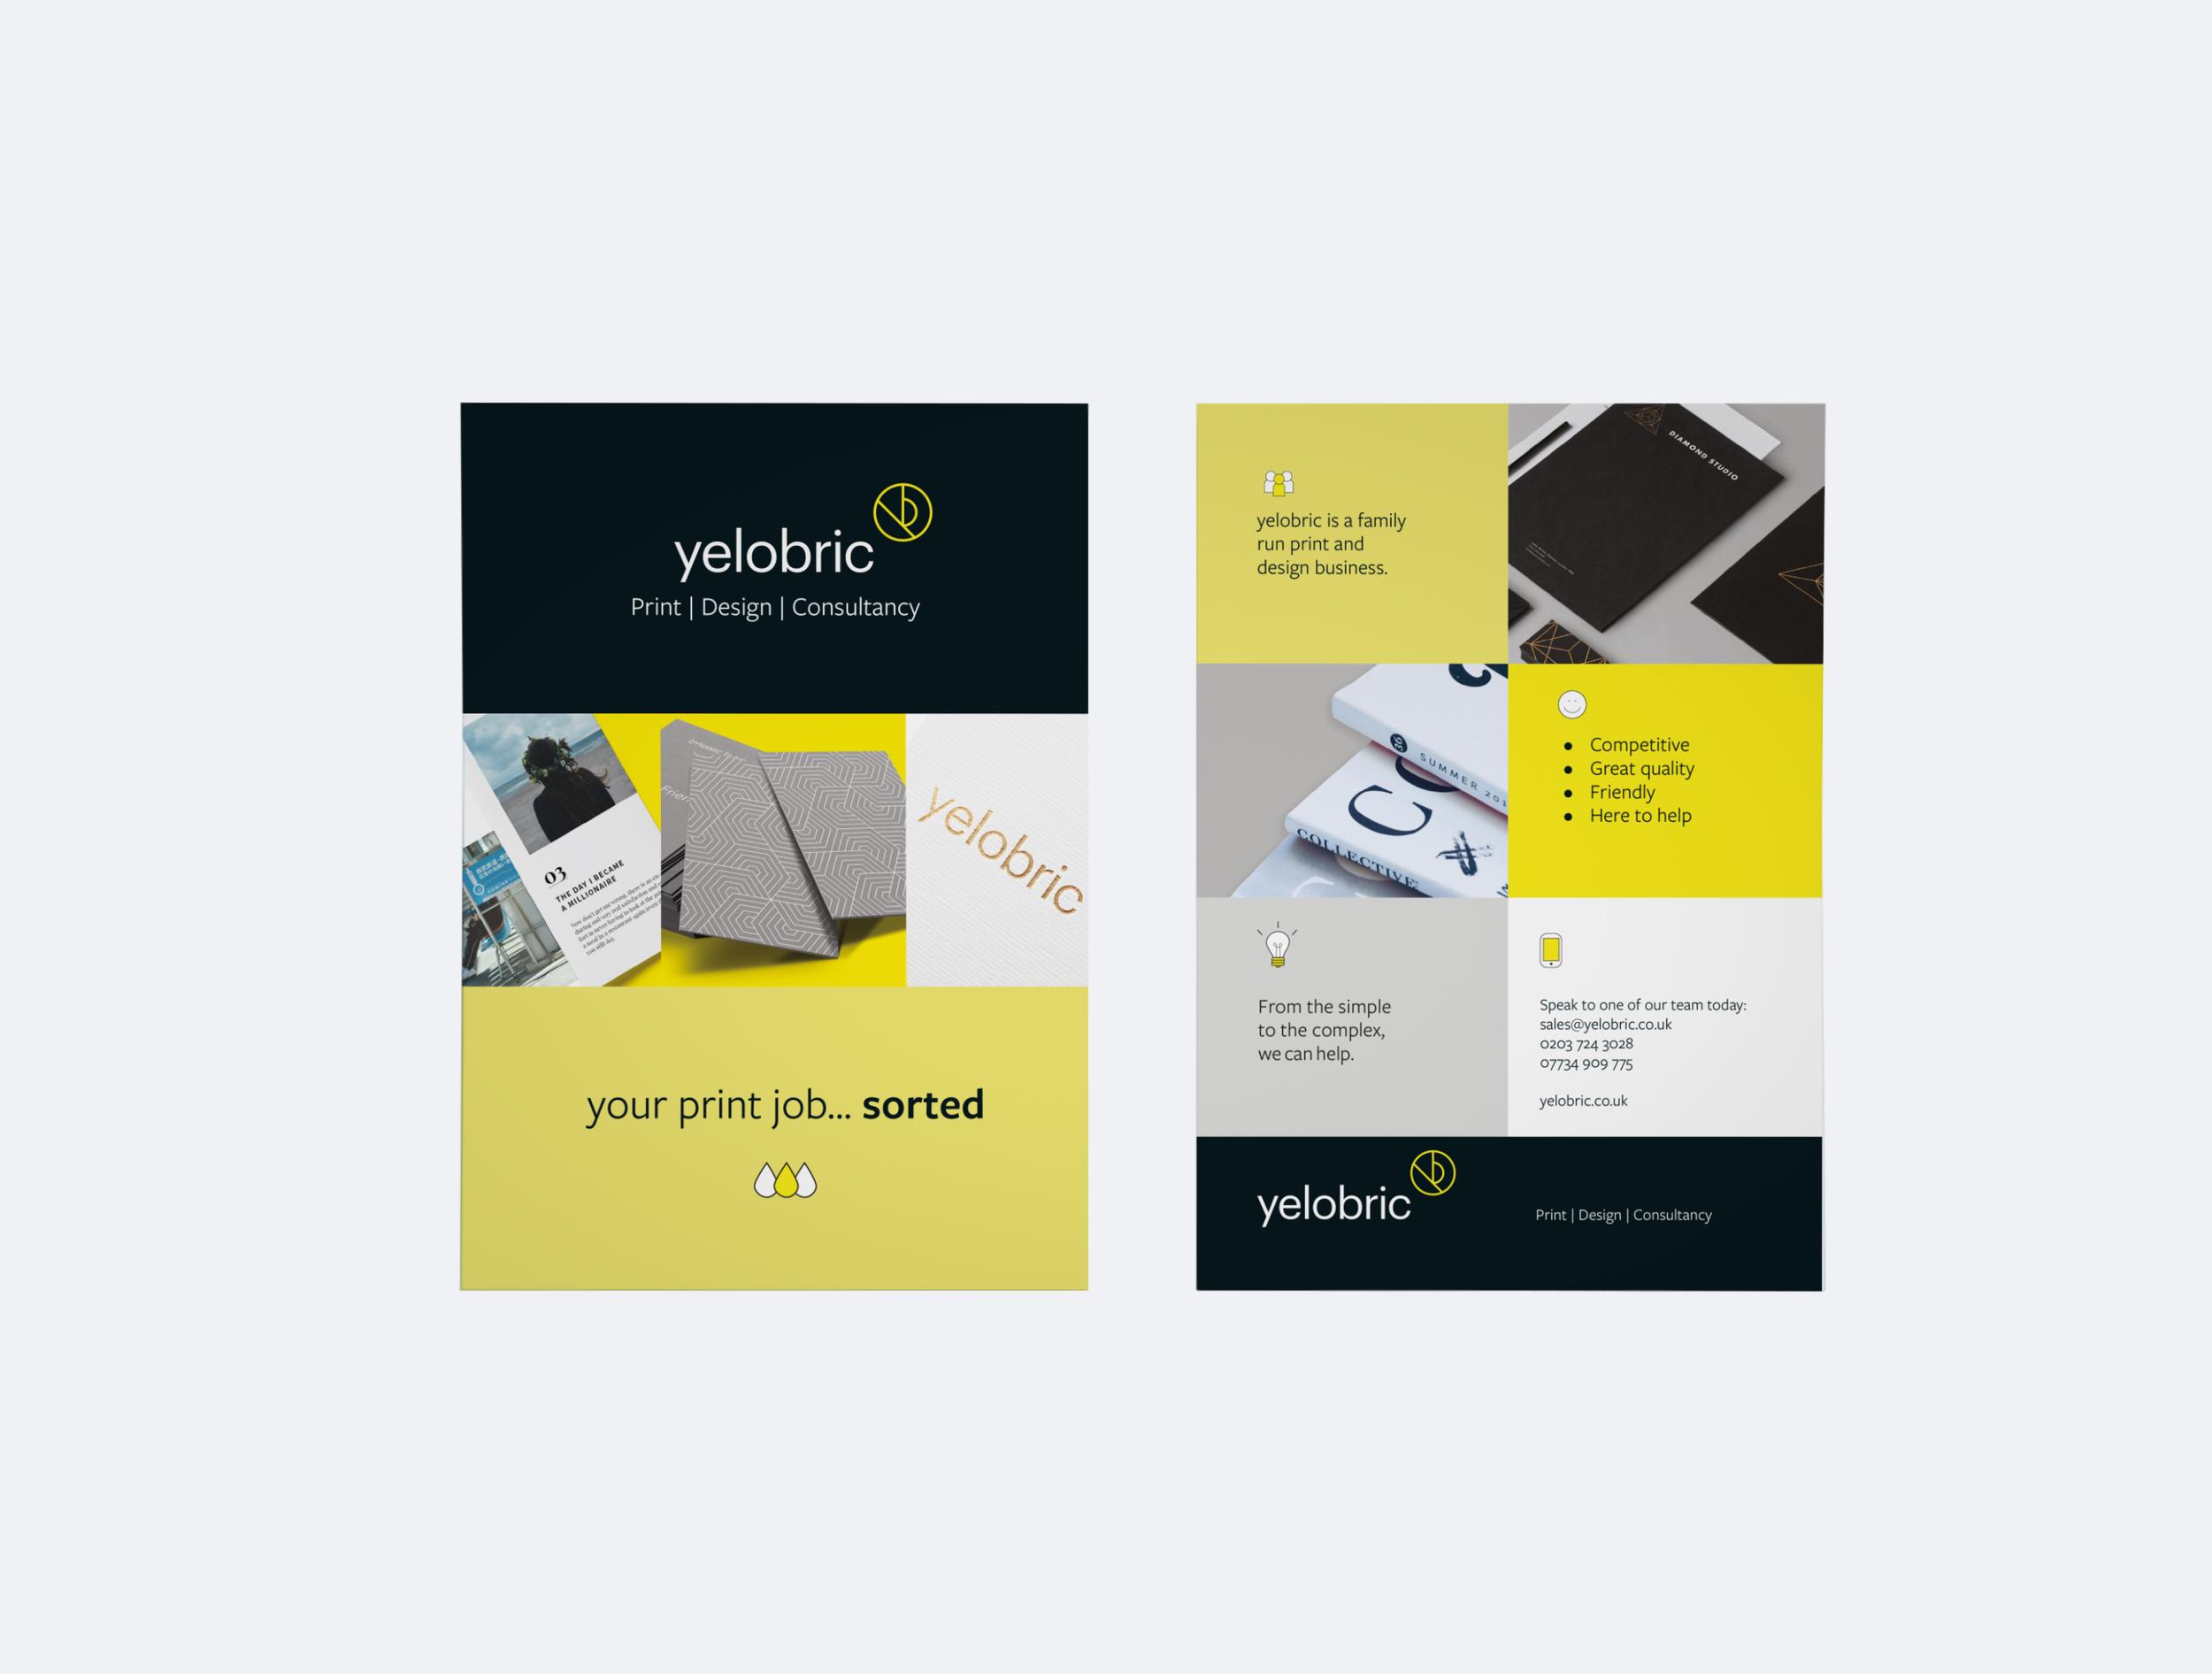 Yelobric-Leaflet-mock-up-white-BG.png